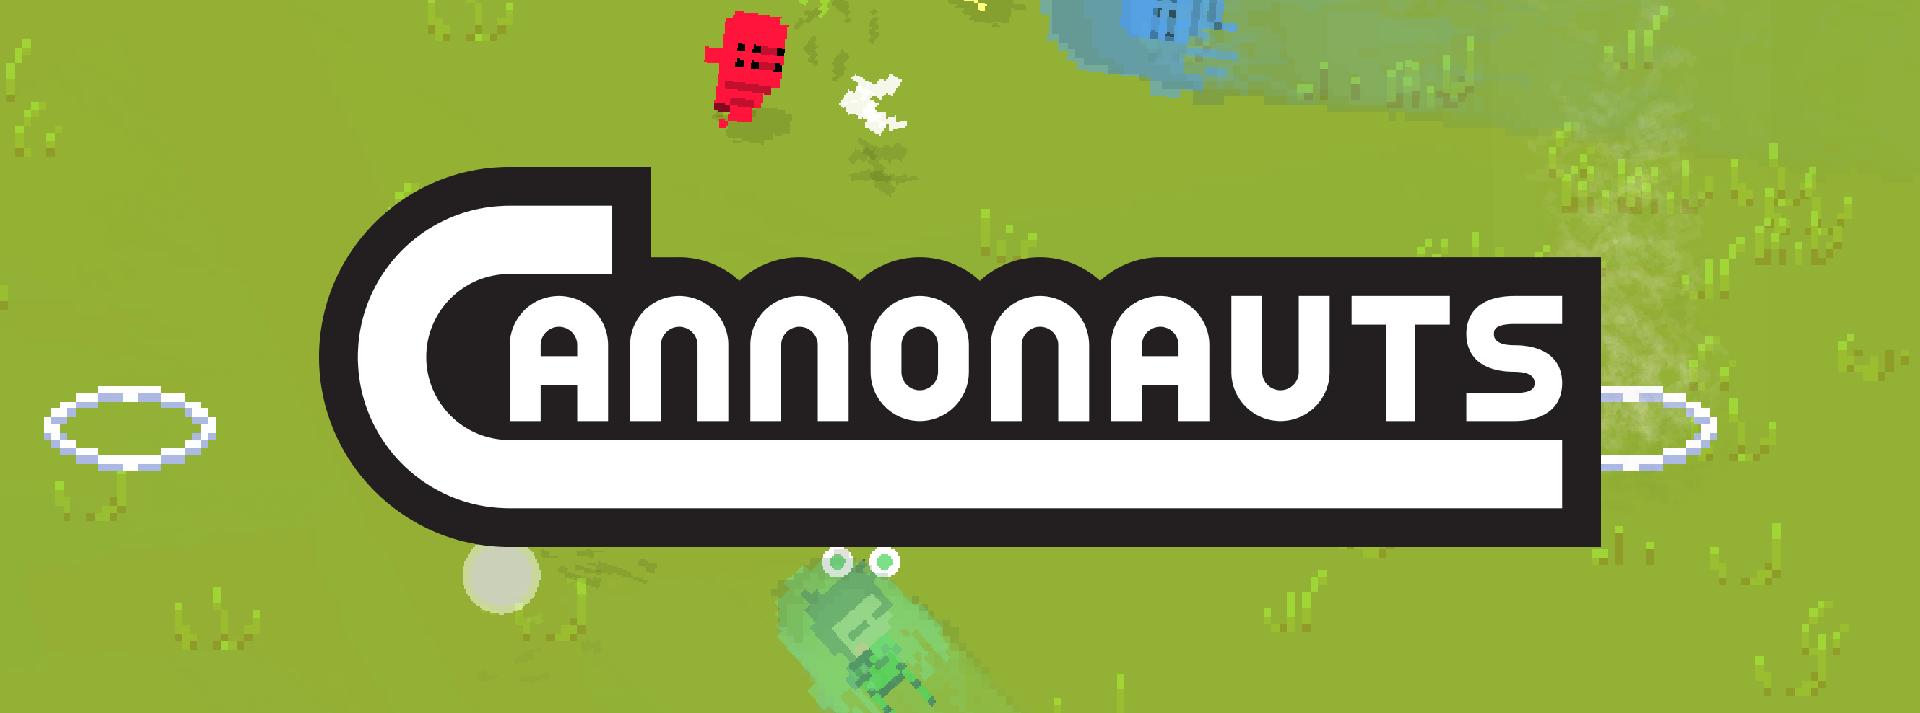 Cannonauts